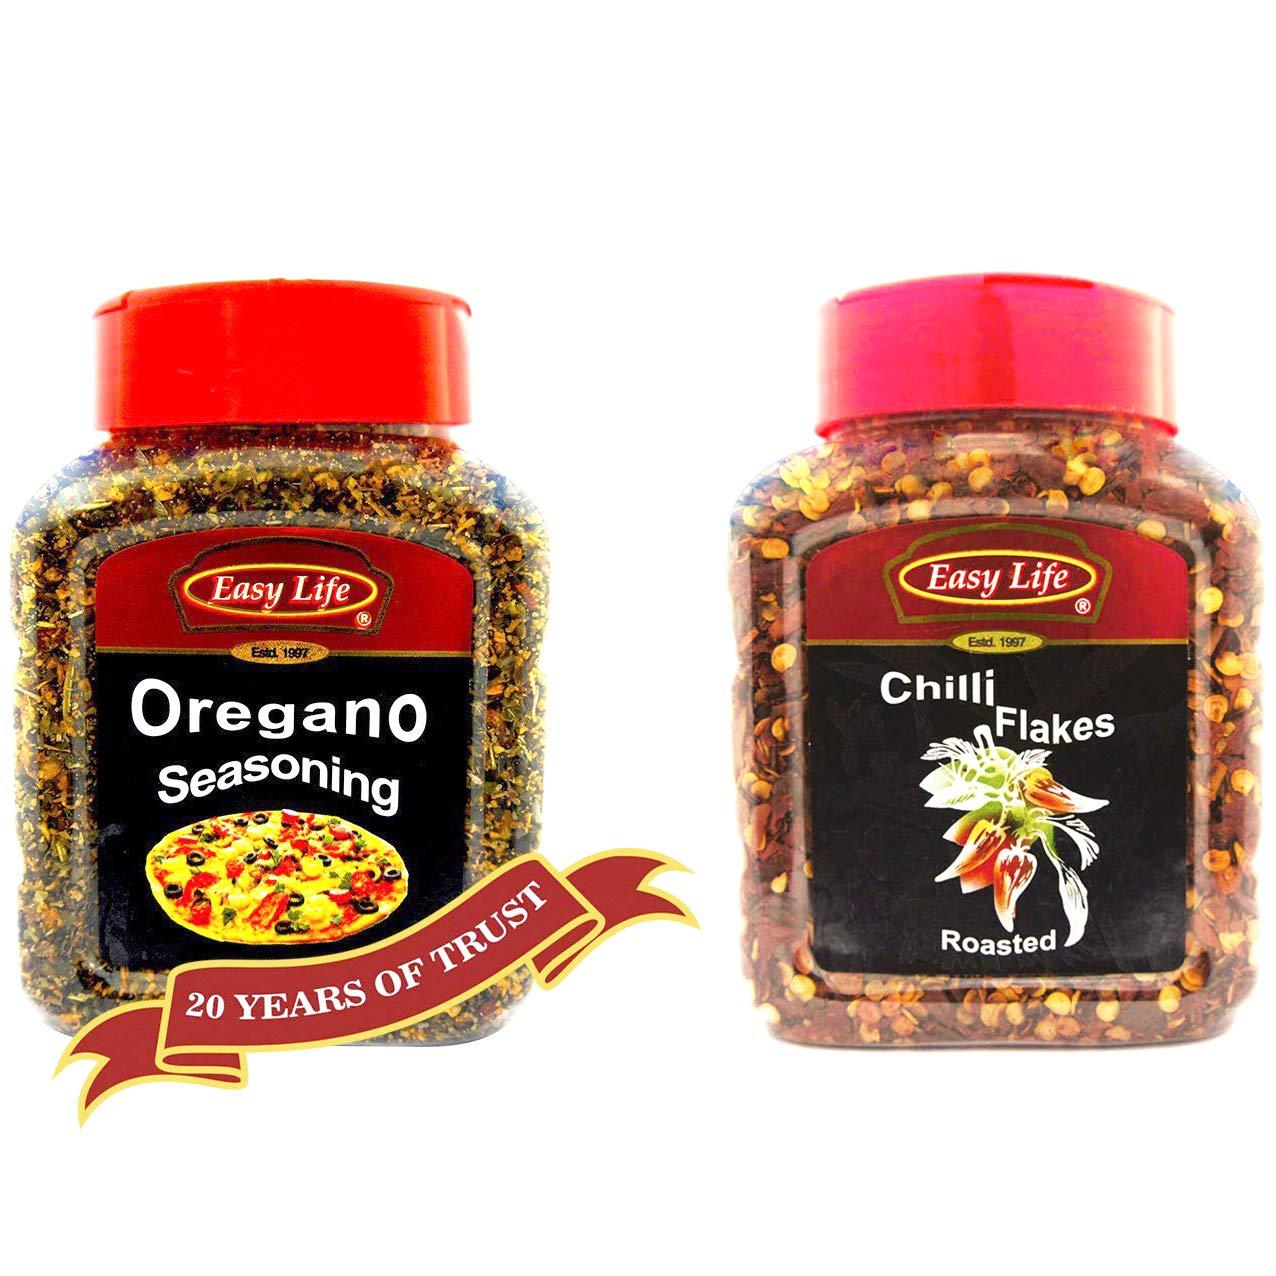 Oregano seasoning online dating